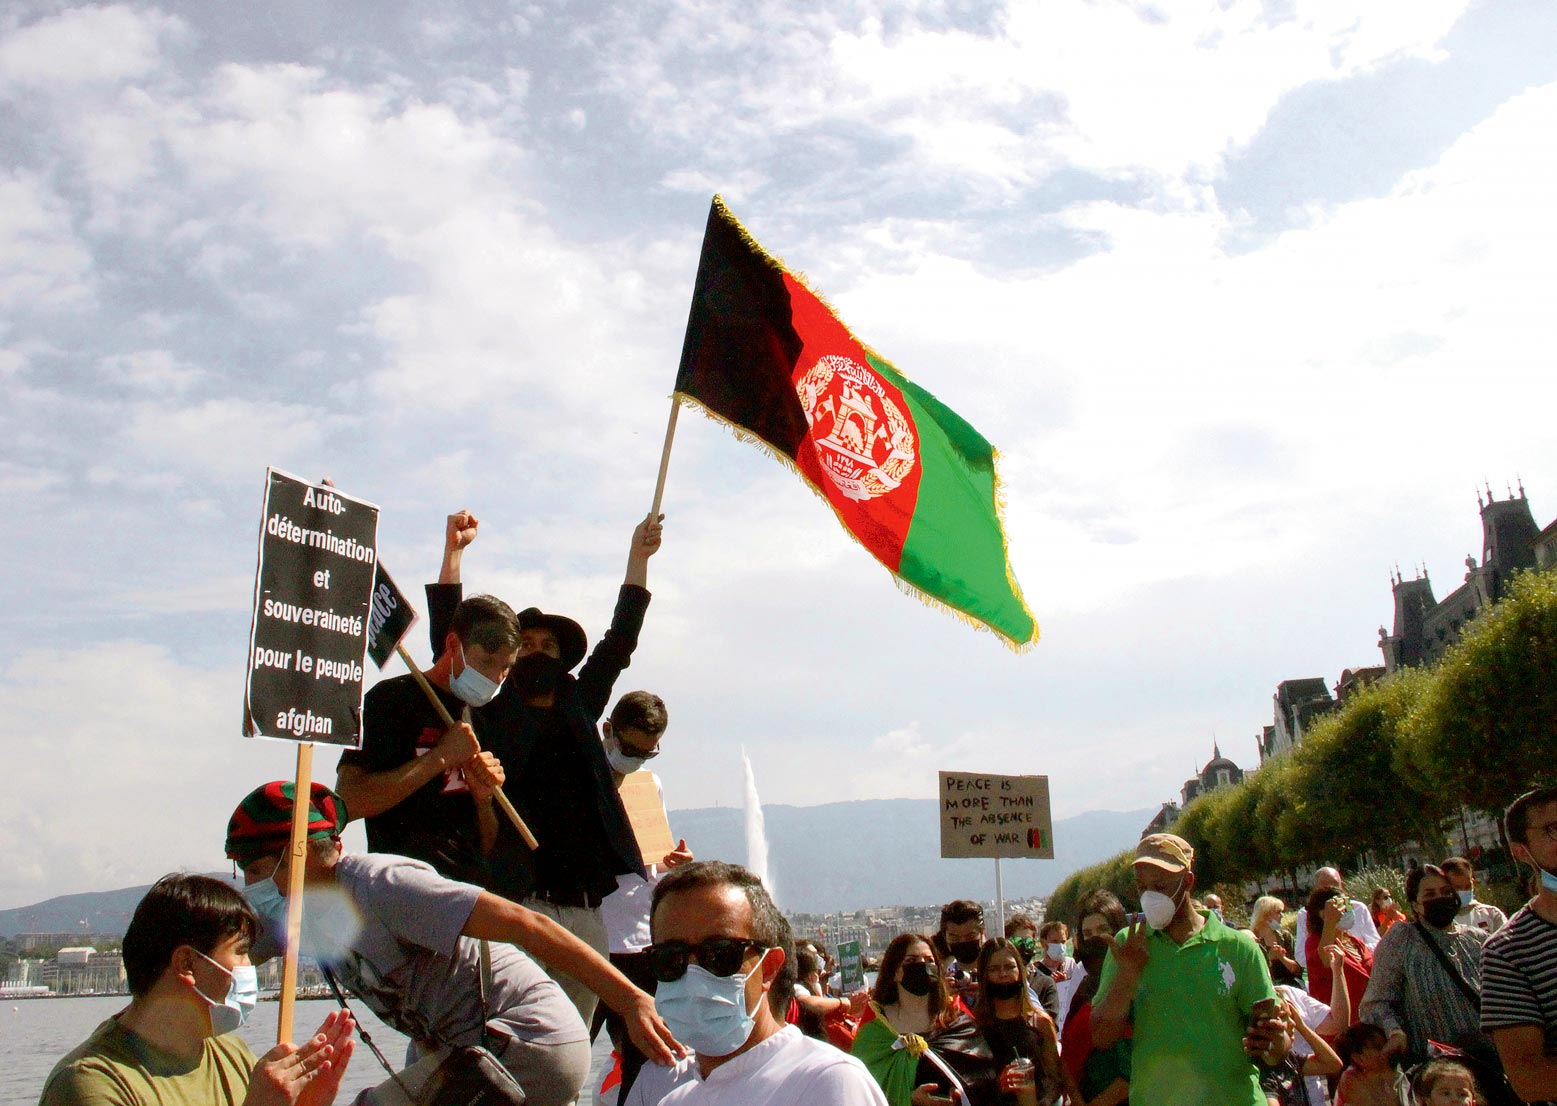 Manifestation en solidarité avec l'Afghanistan